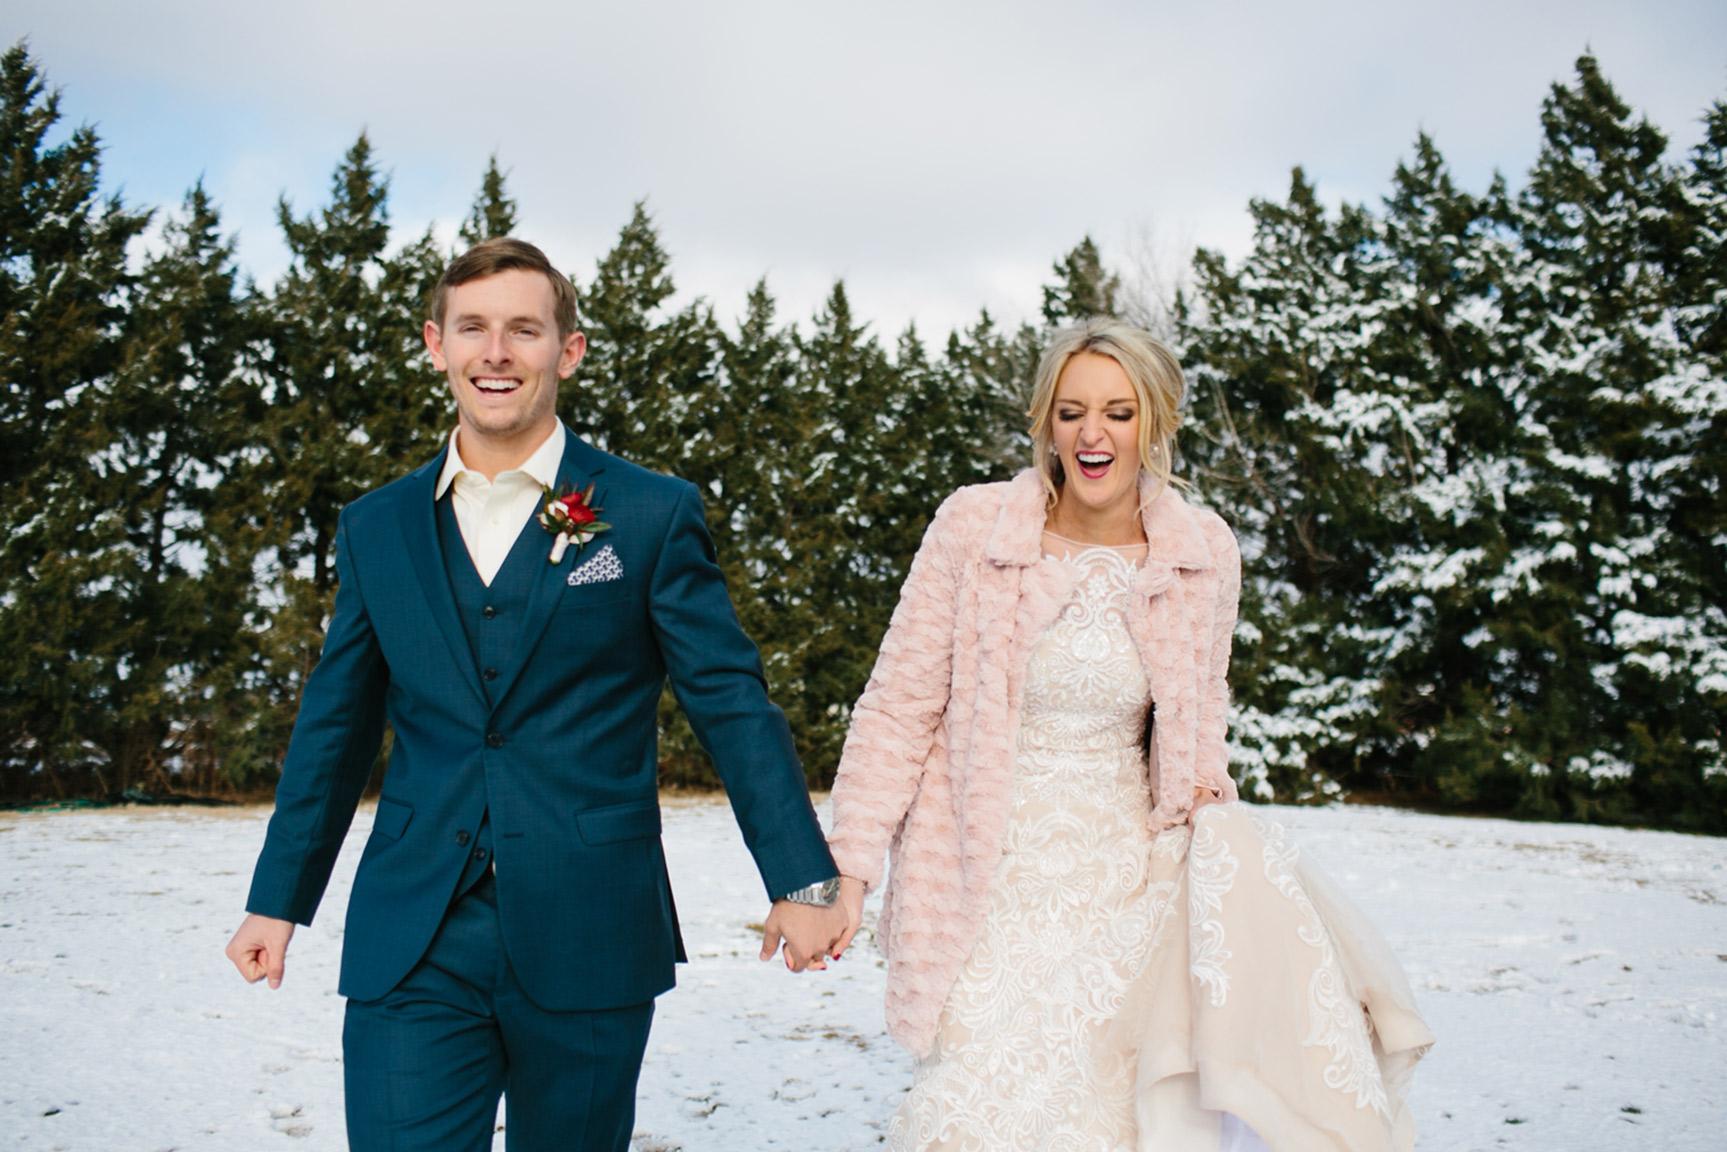 Cotton_Creek_Barn_Winter_Wedding_WeddingPhotographer030.jpg